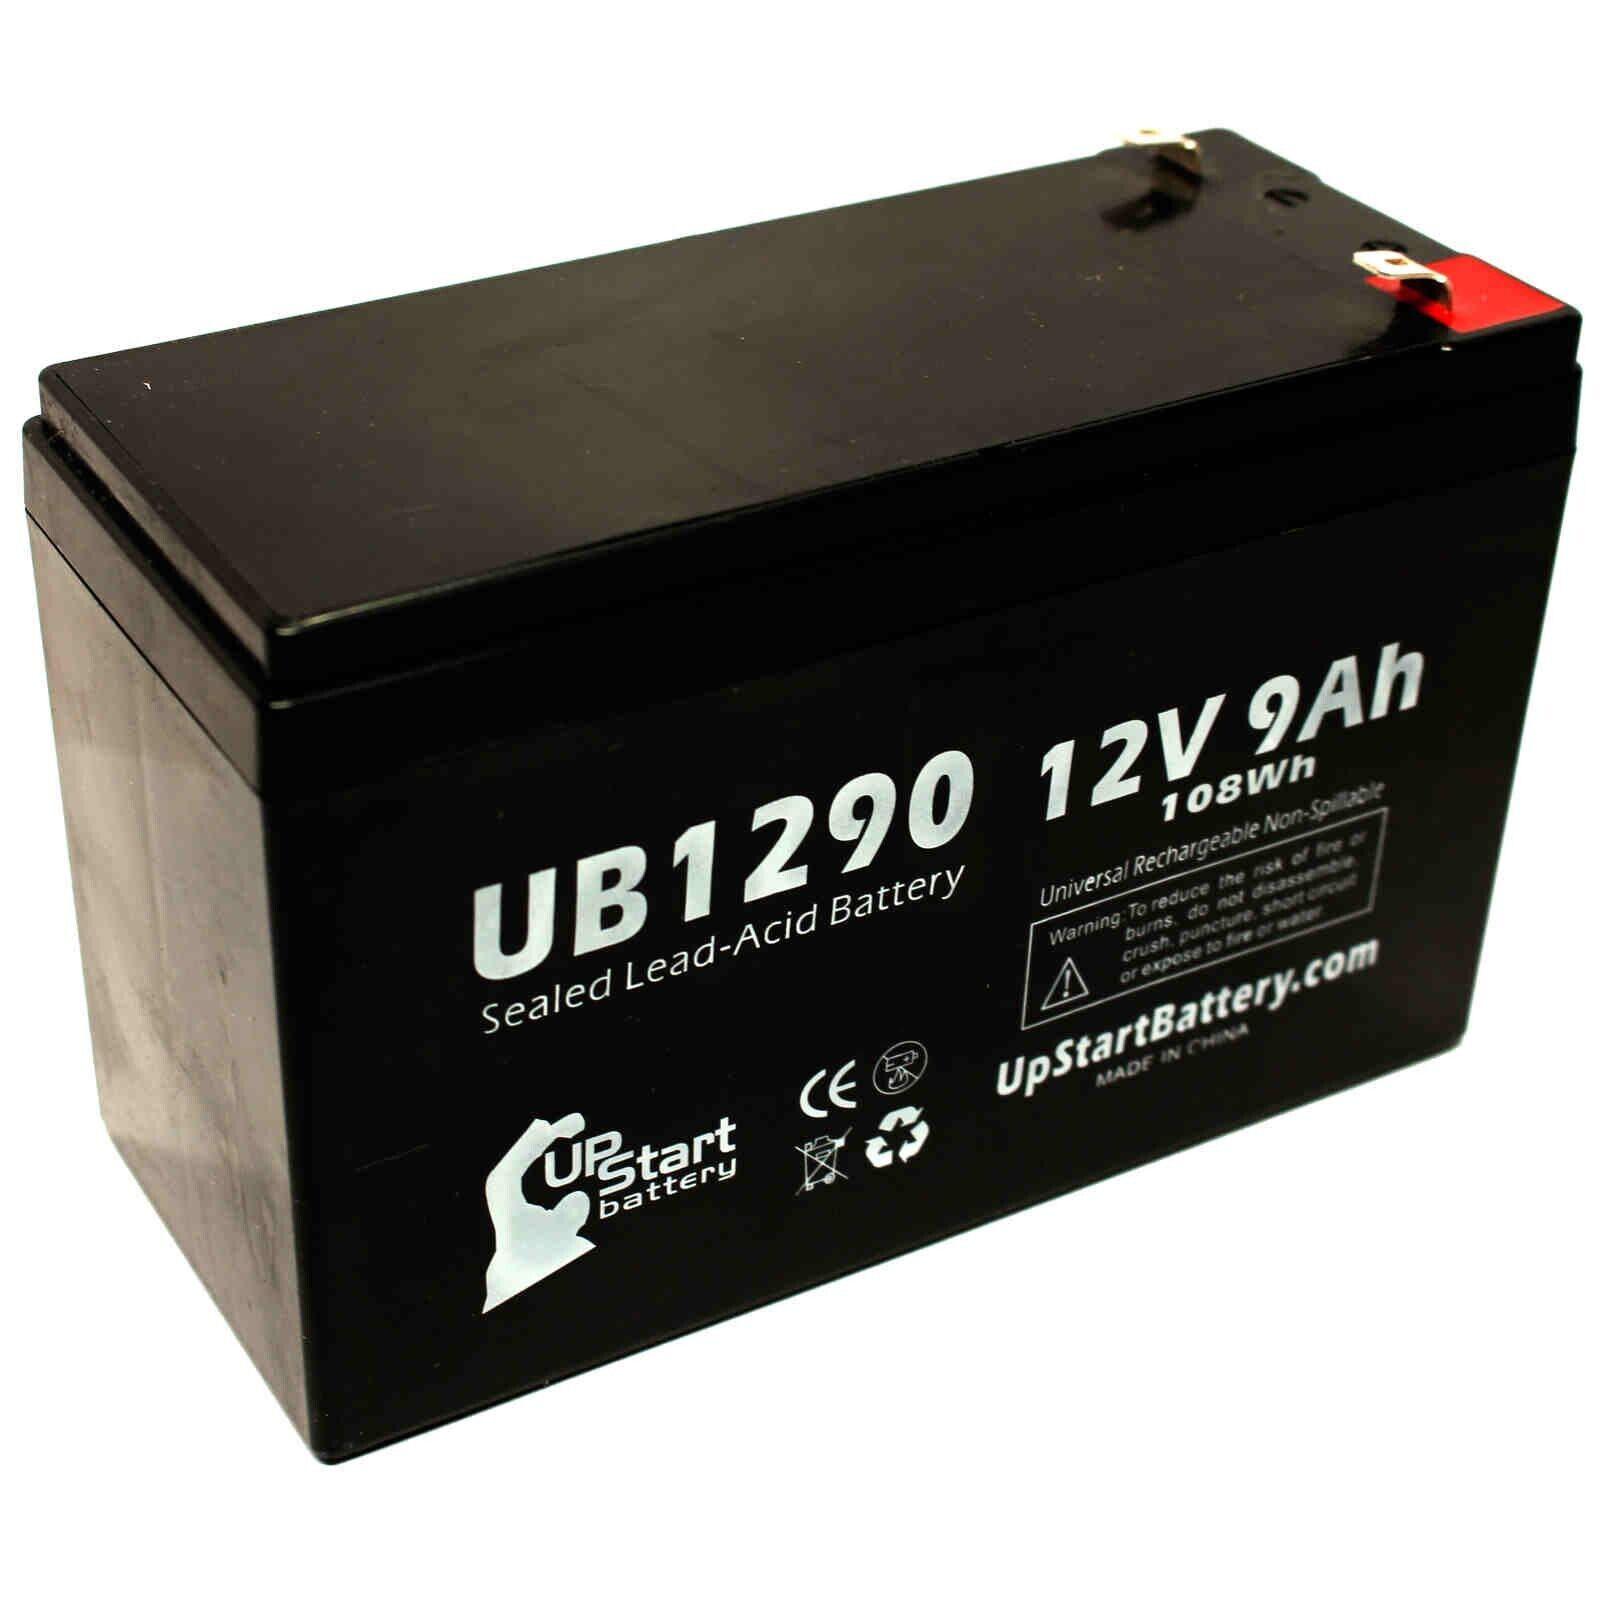 12V 9Ah Sealed Lead Acid Battery For APC BACK-UPS CS 500 BK500 UB1290